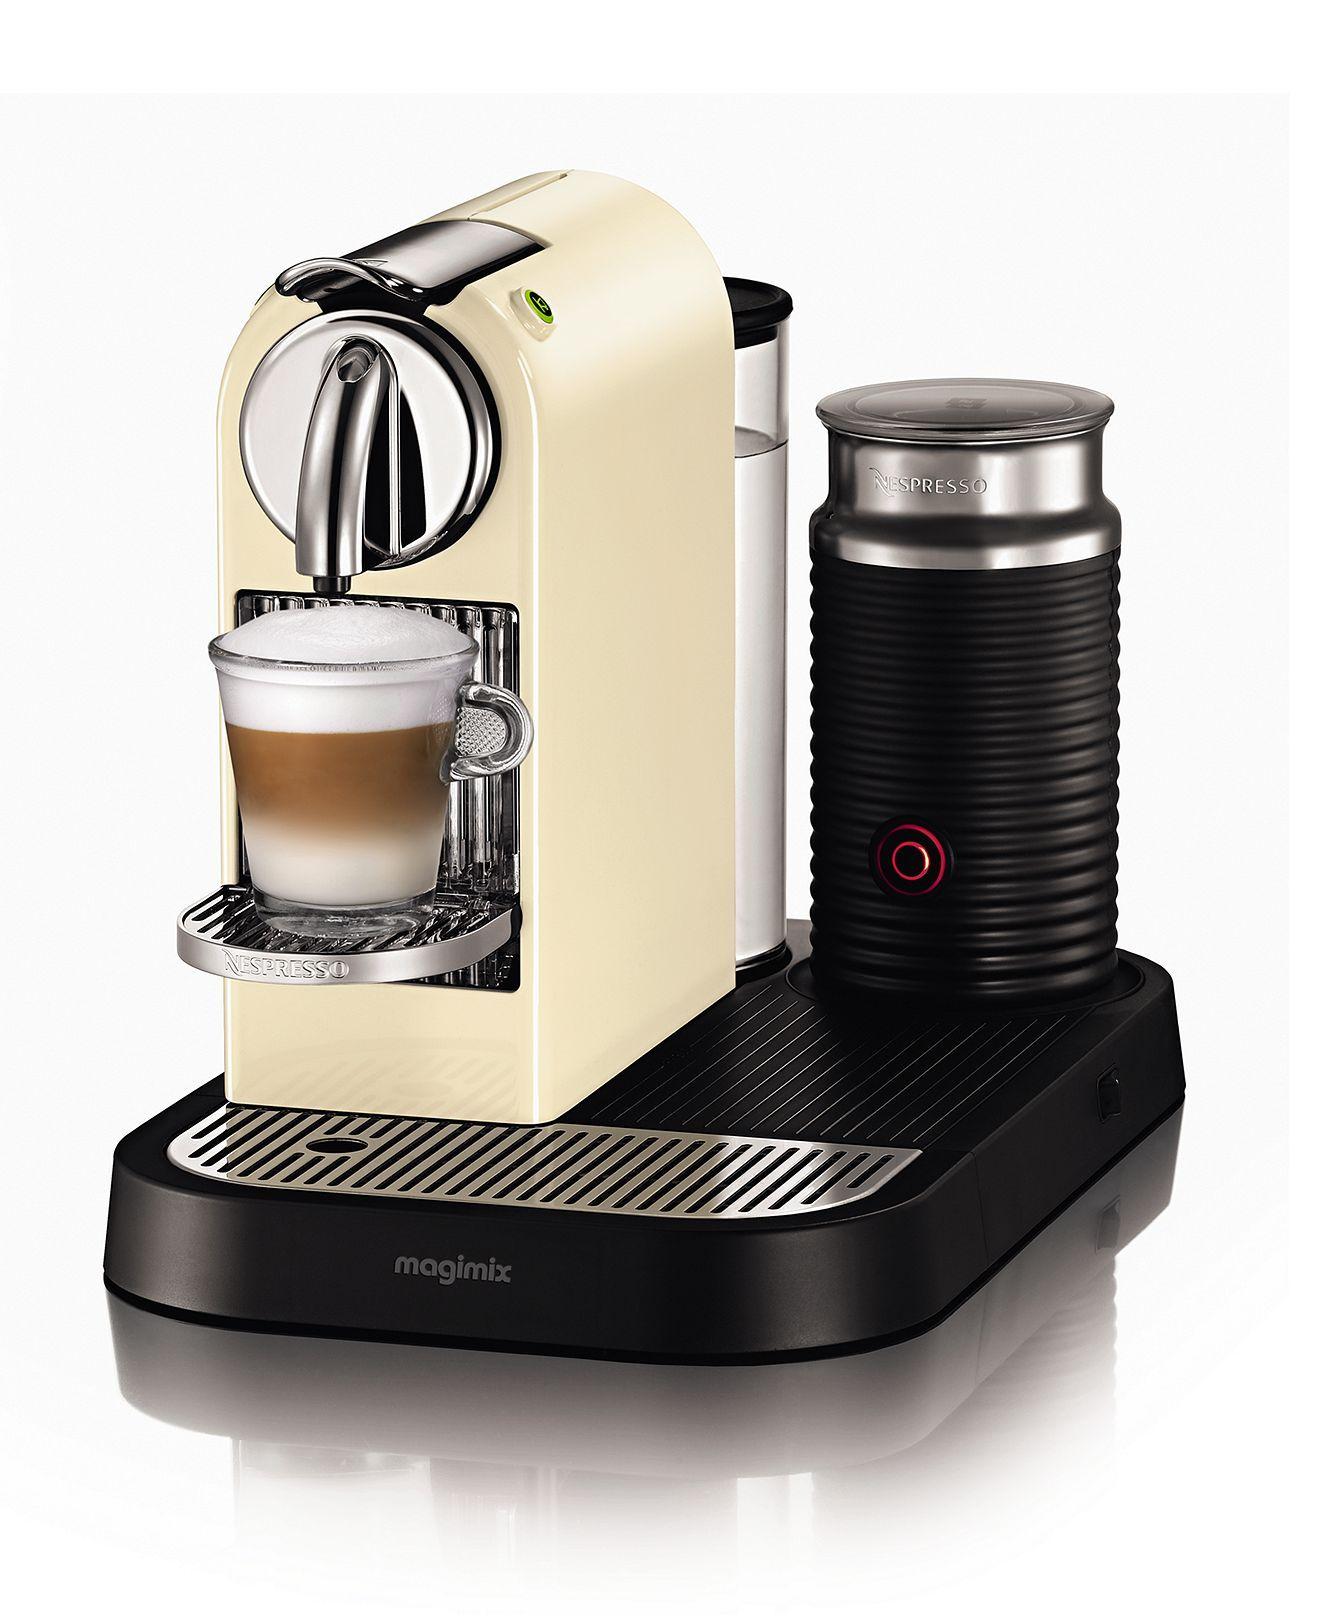 Nespresso D120 Espresso Maker Citiz Single Serve With Milk